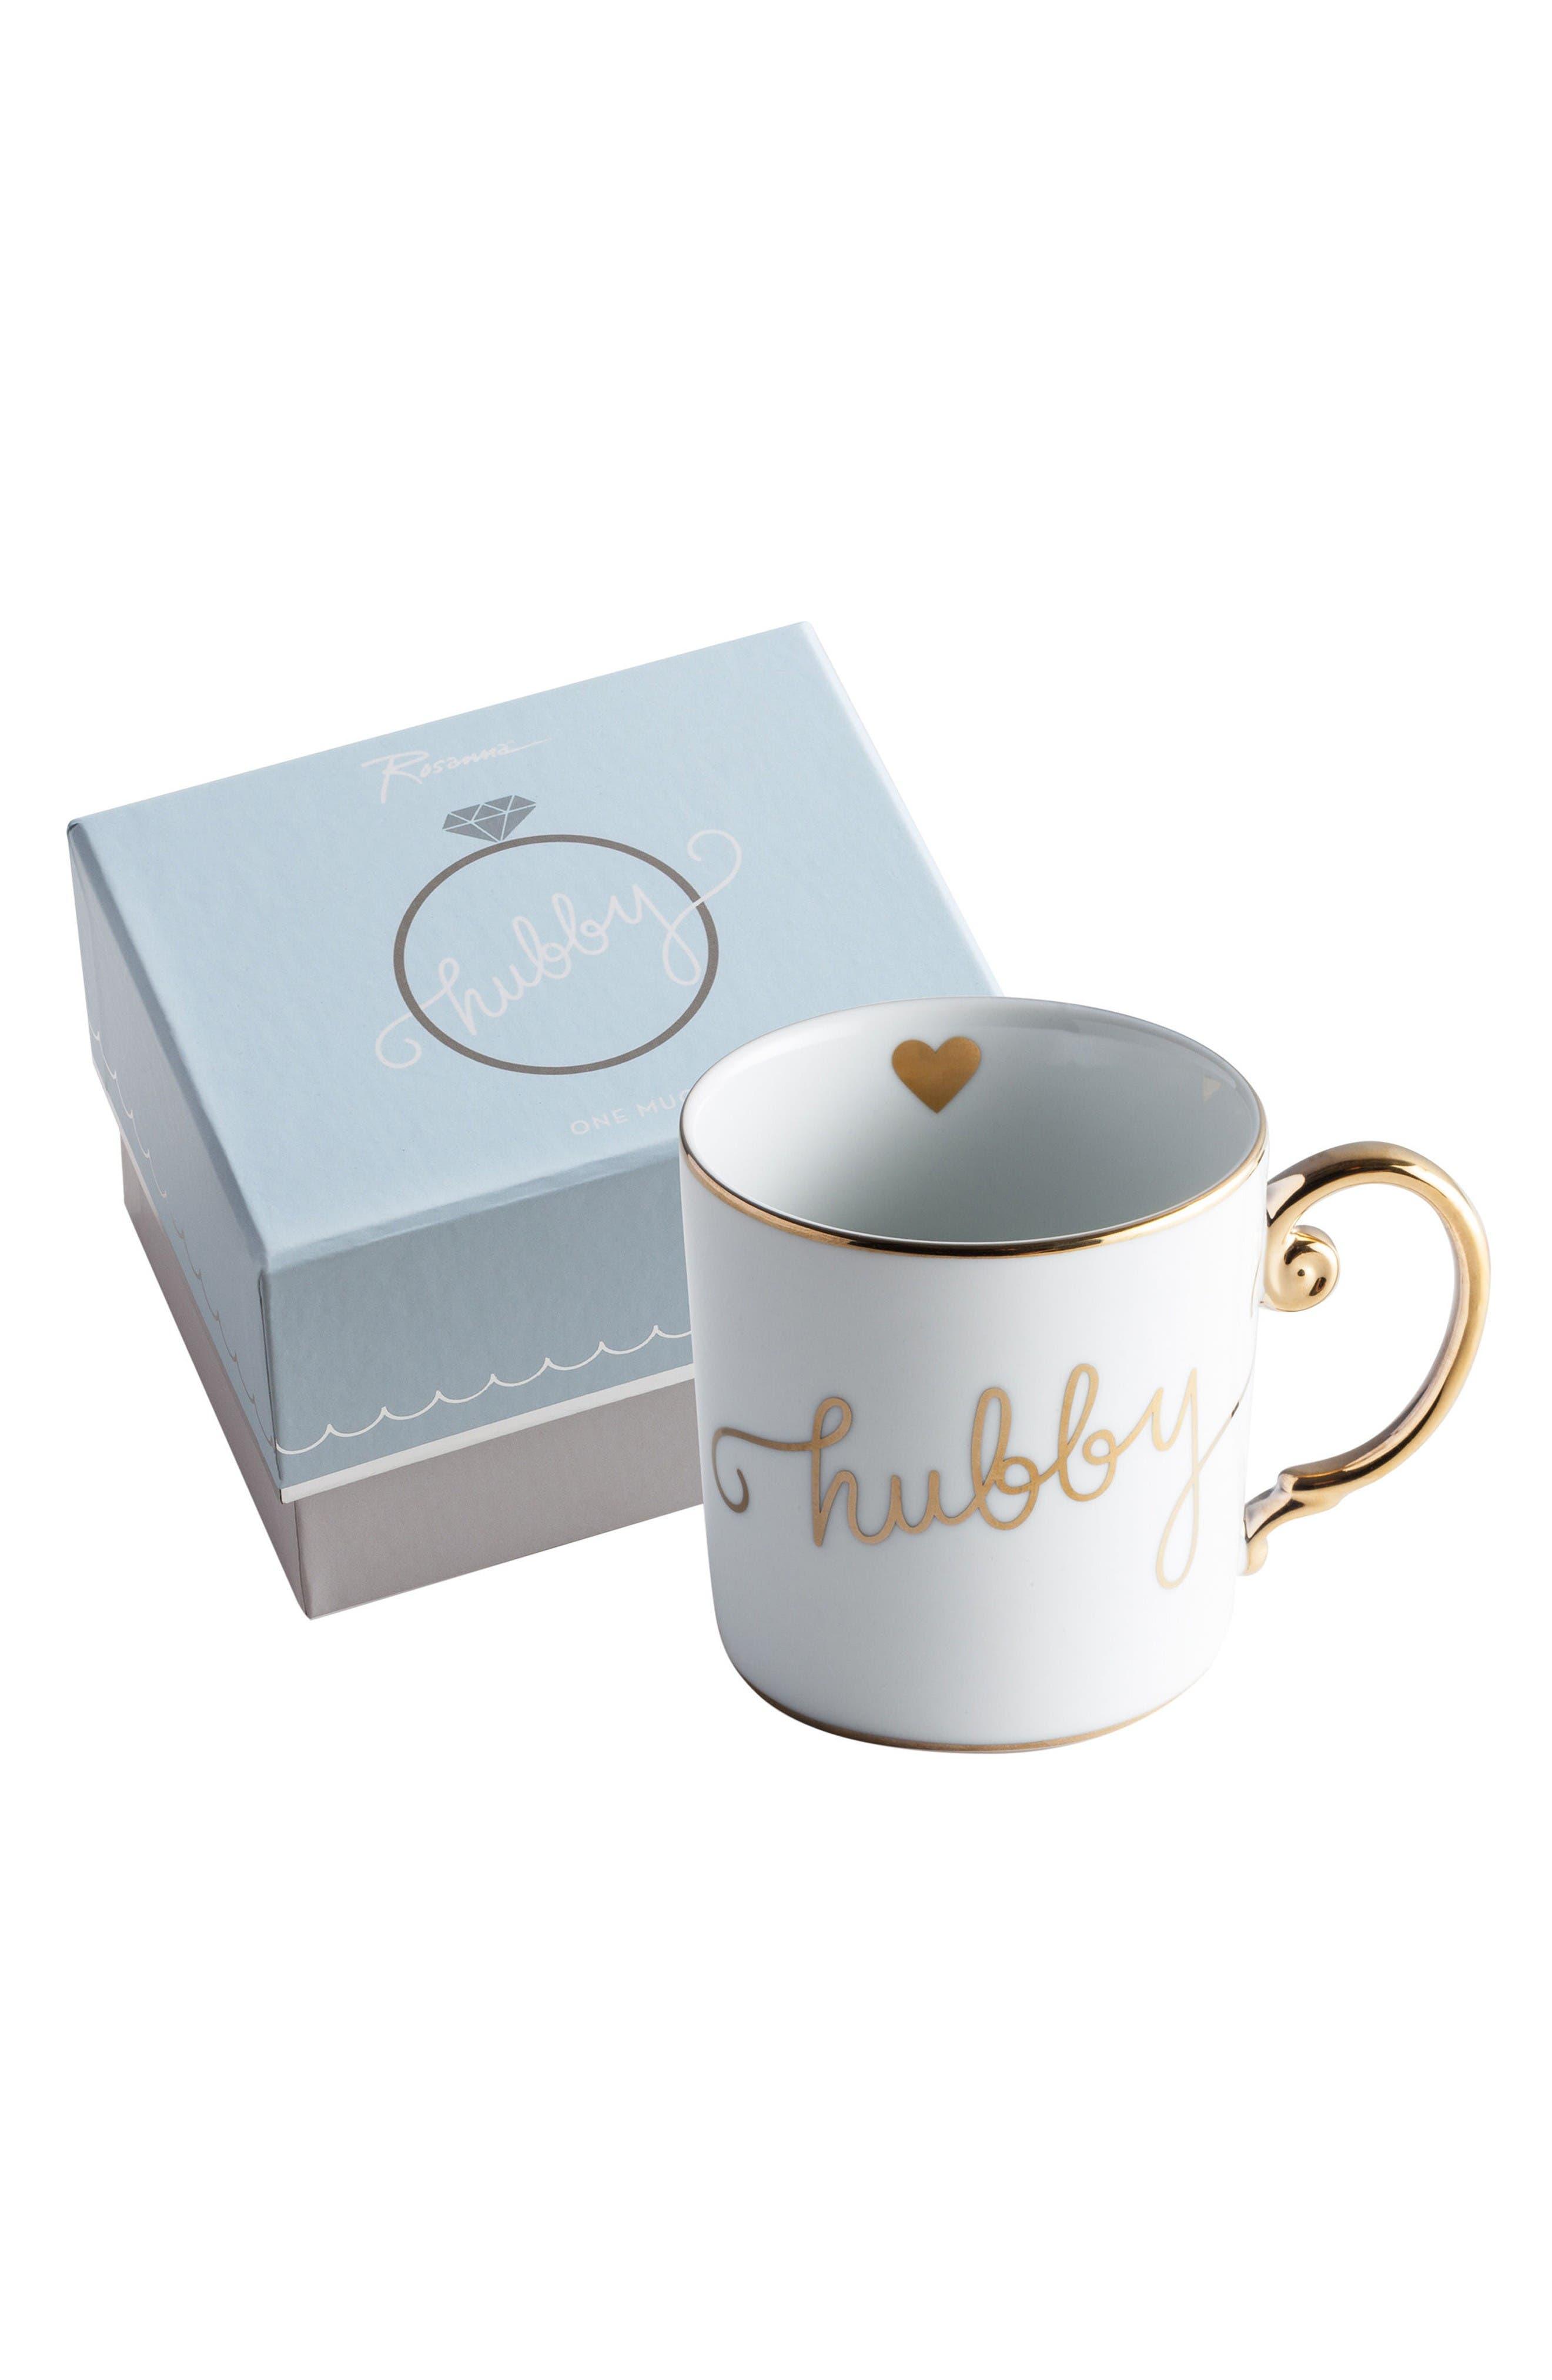 Rosanna Hubby/Wifey Porcelain Mug